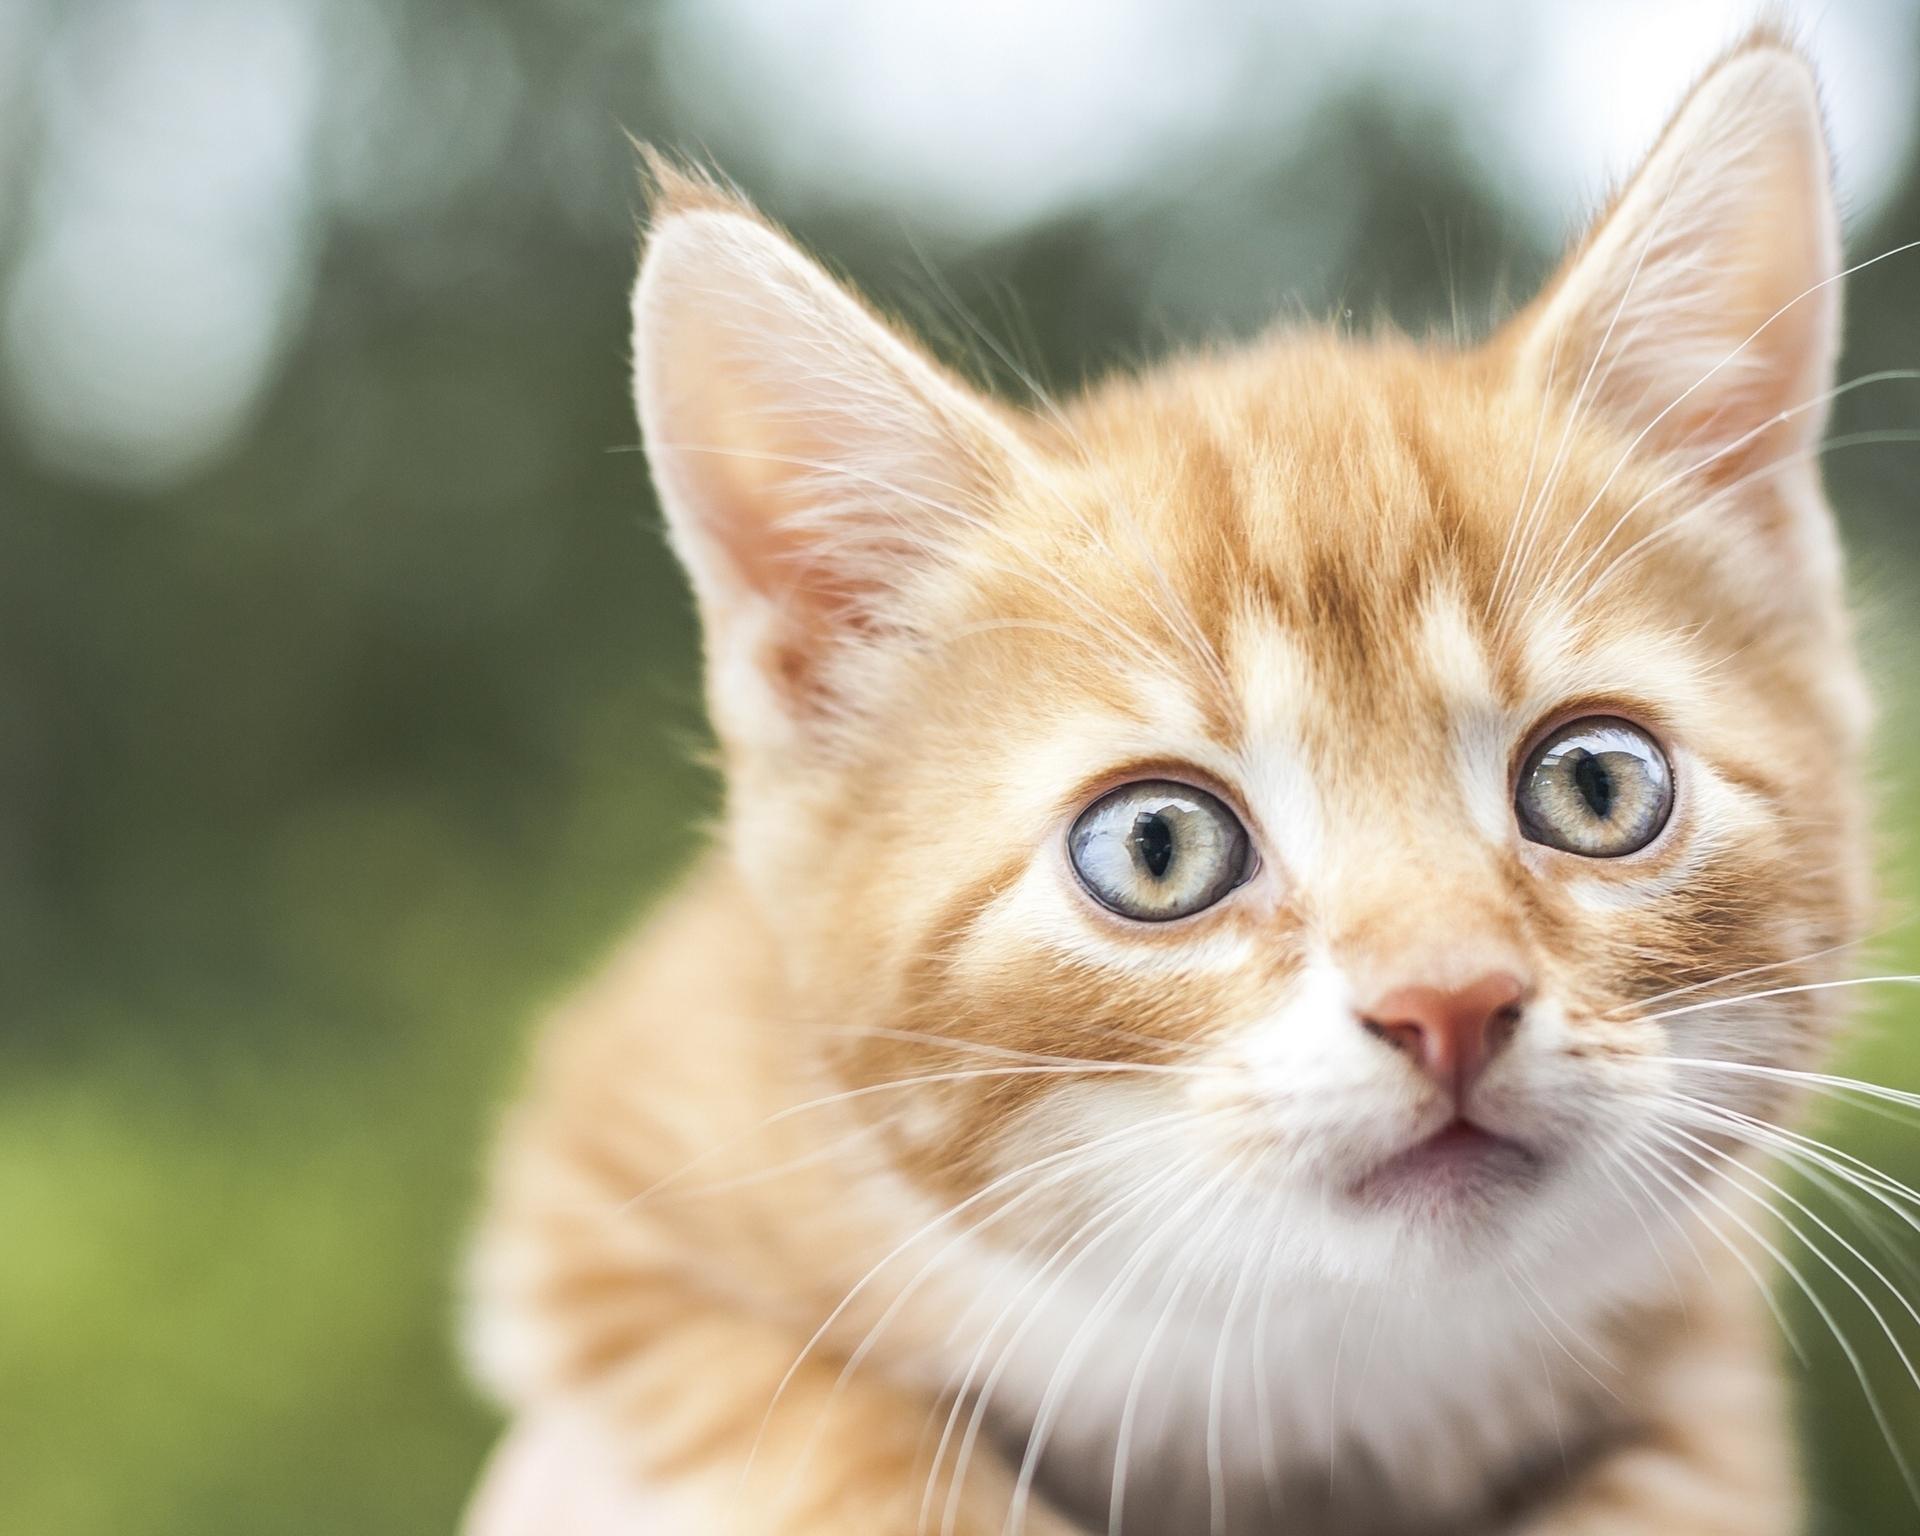 картинки мордашки кошечки высокого уровня